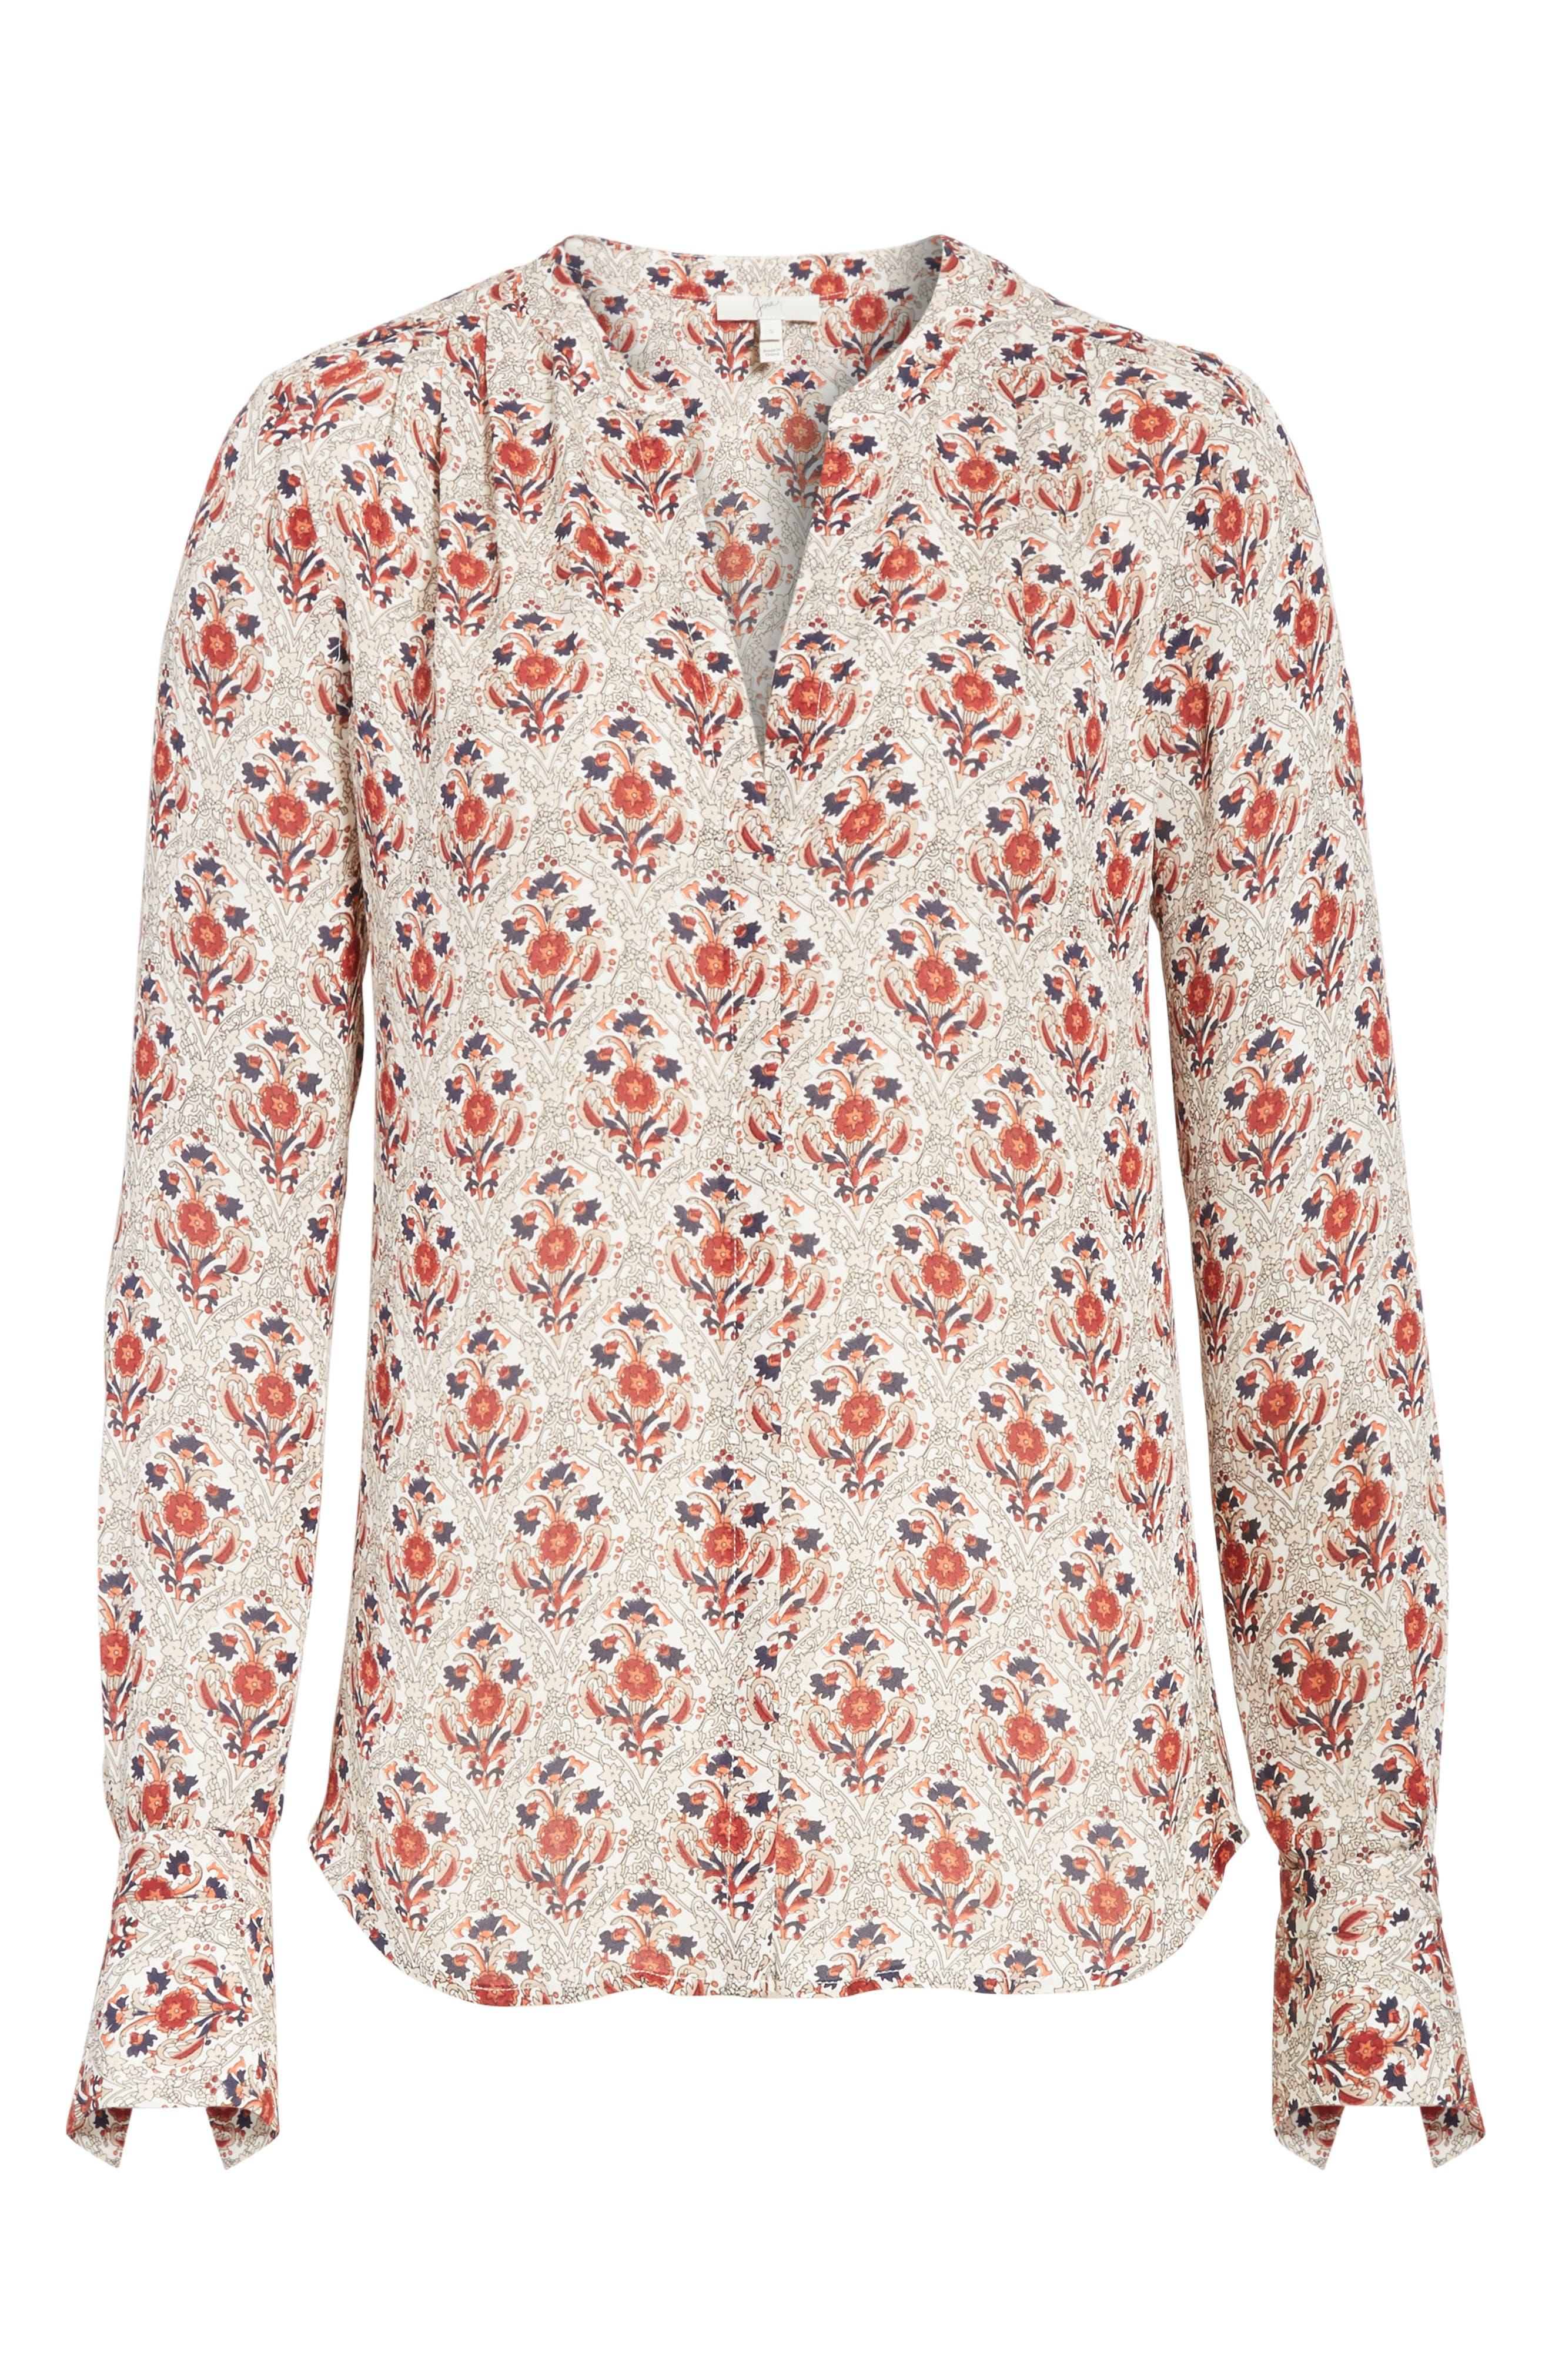 Jamiona Floral Silk Top,                             Alternate thumbnail 6, color,                             114